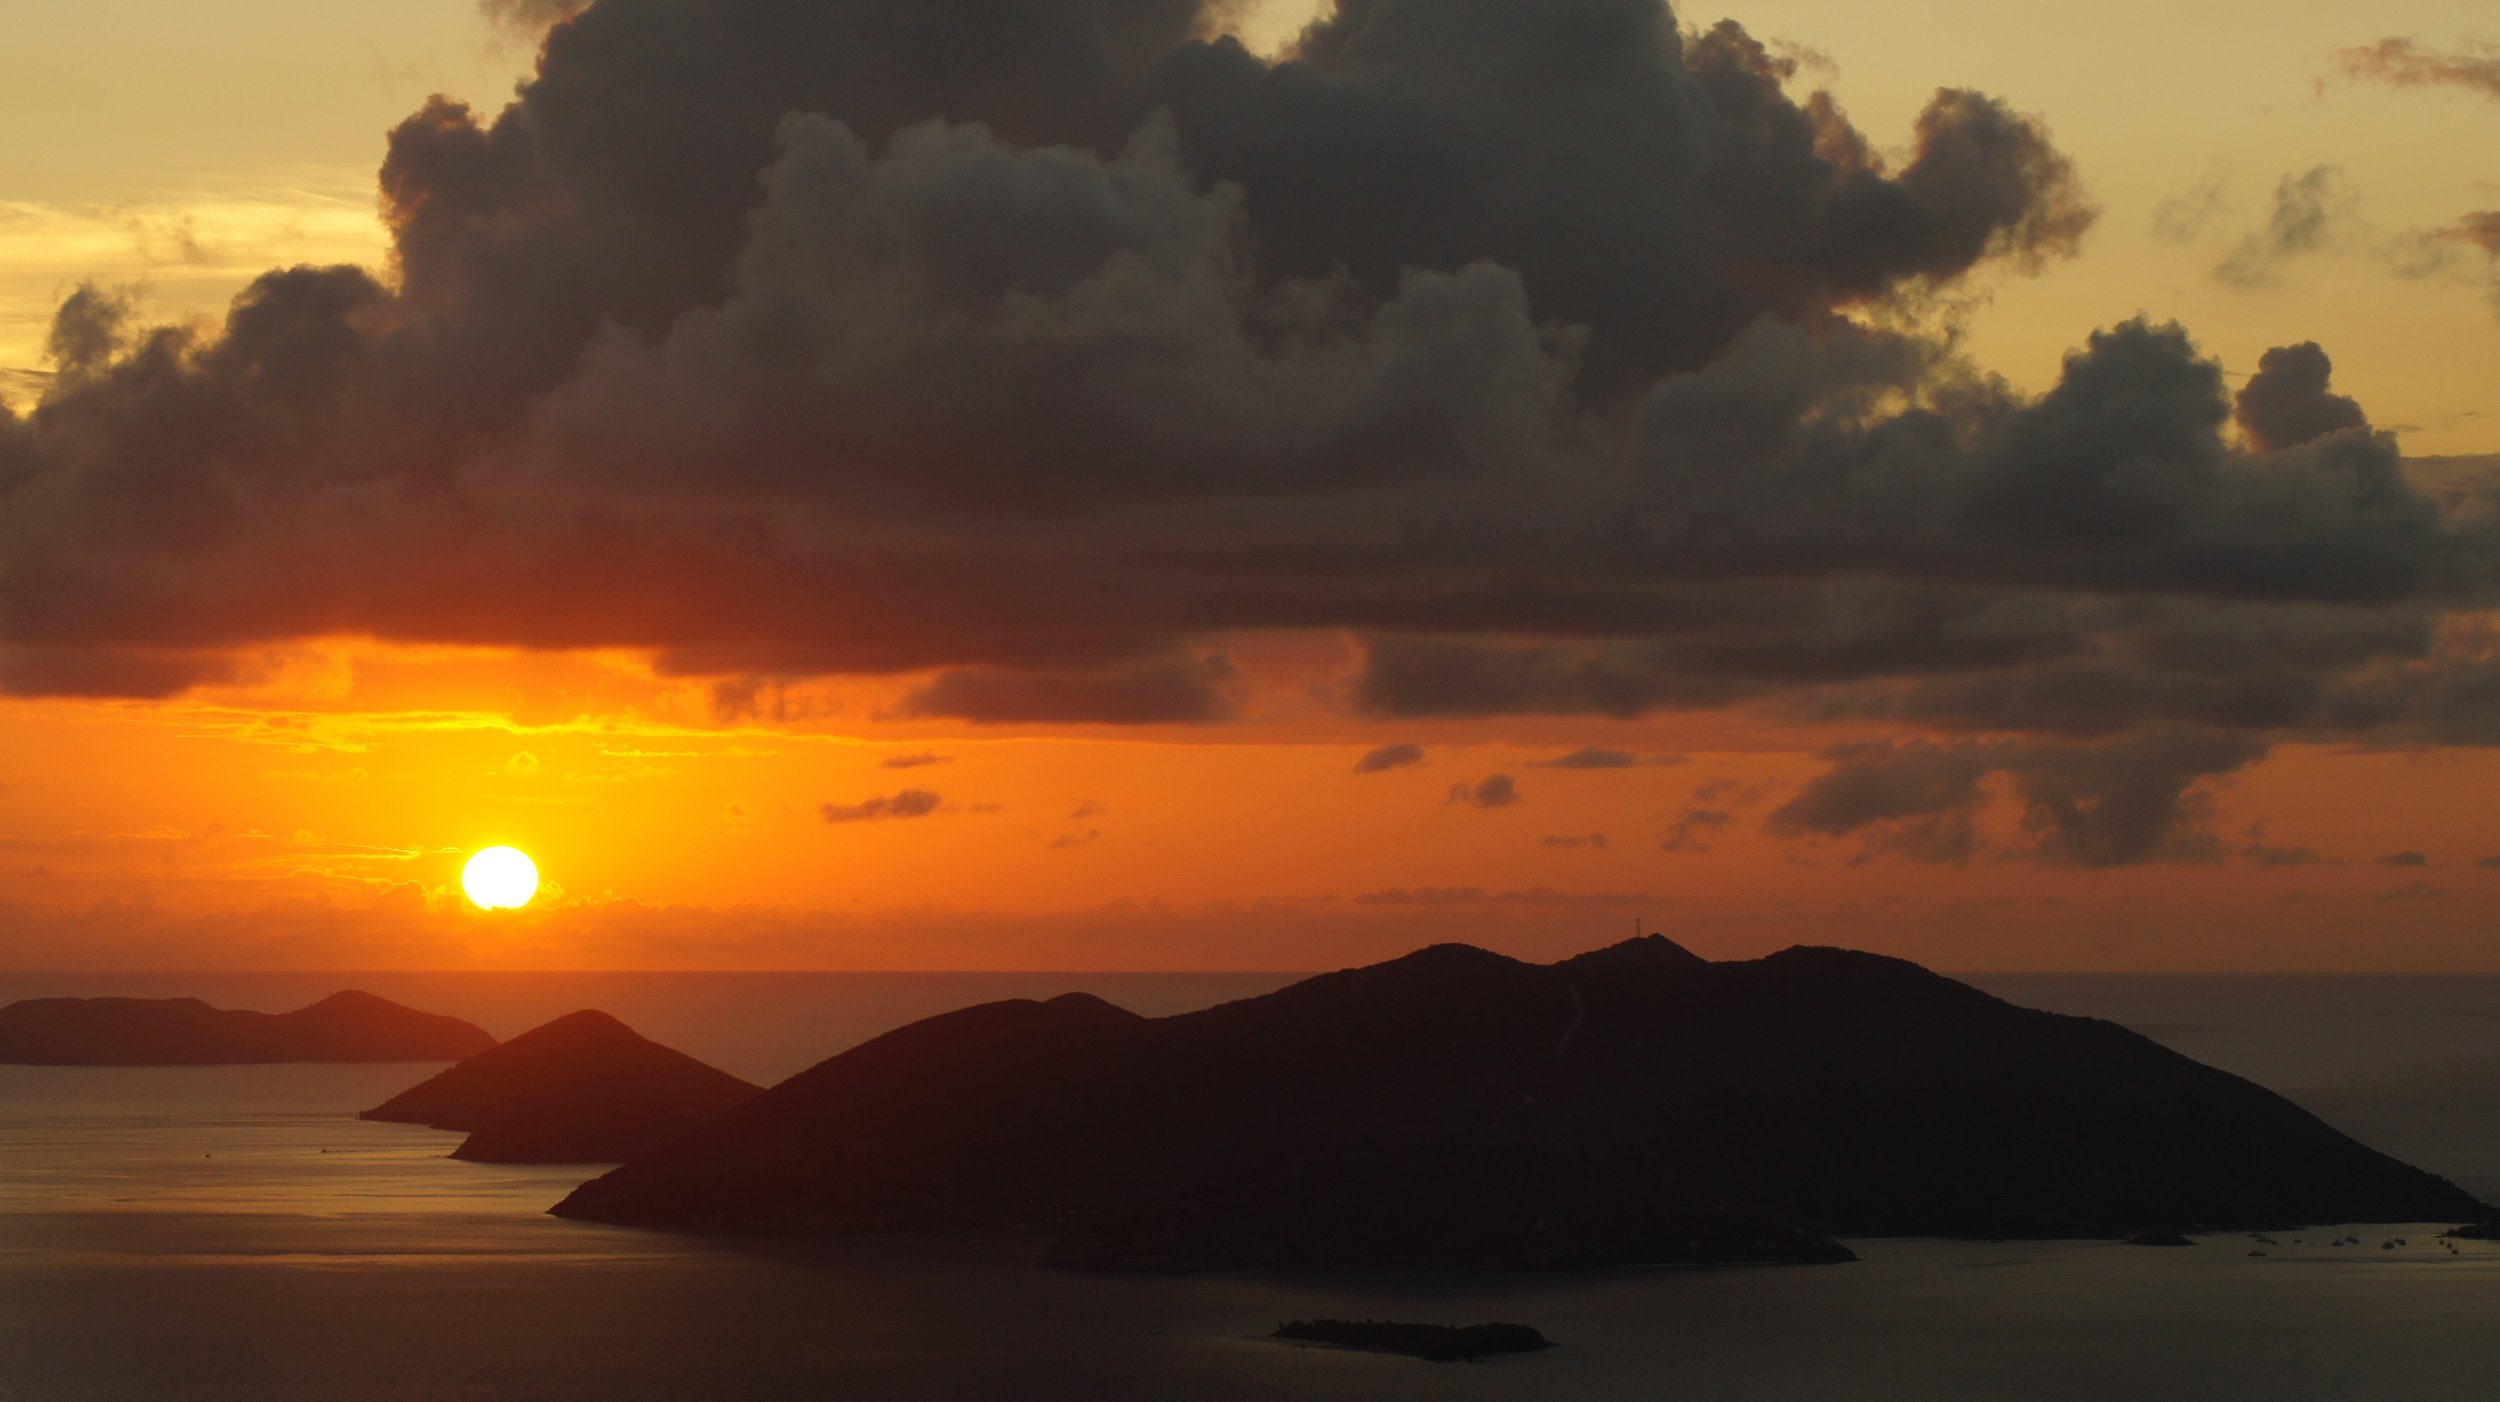 BVI's at sunset